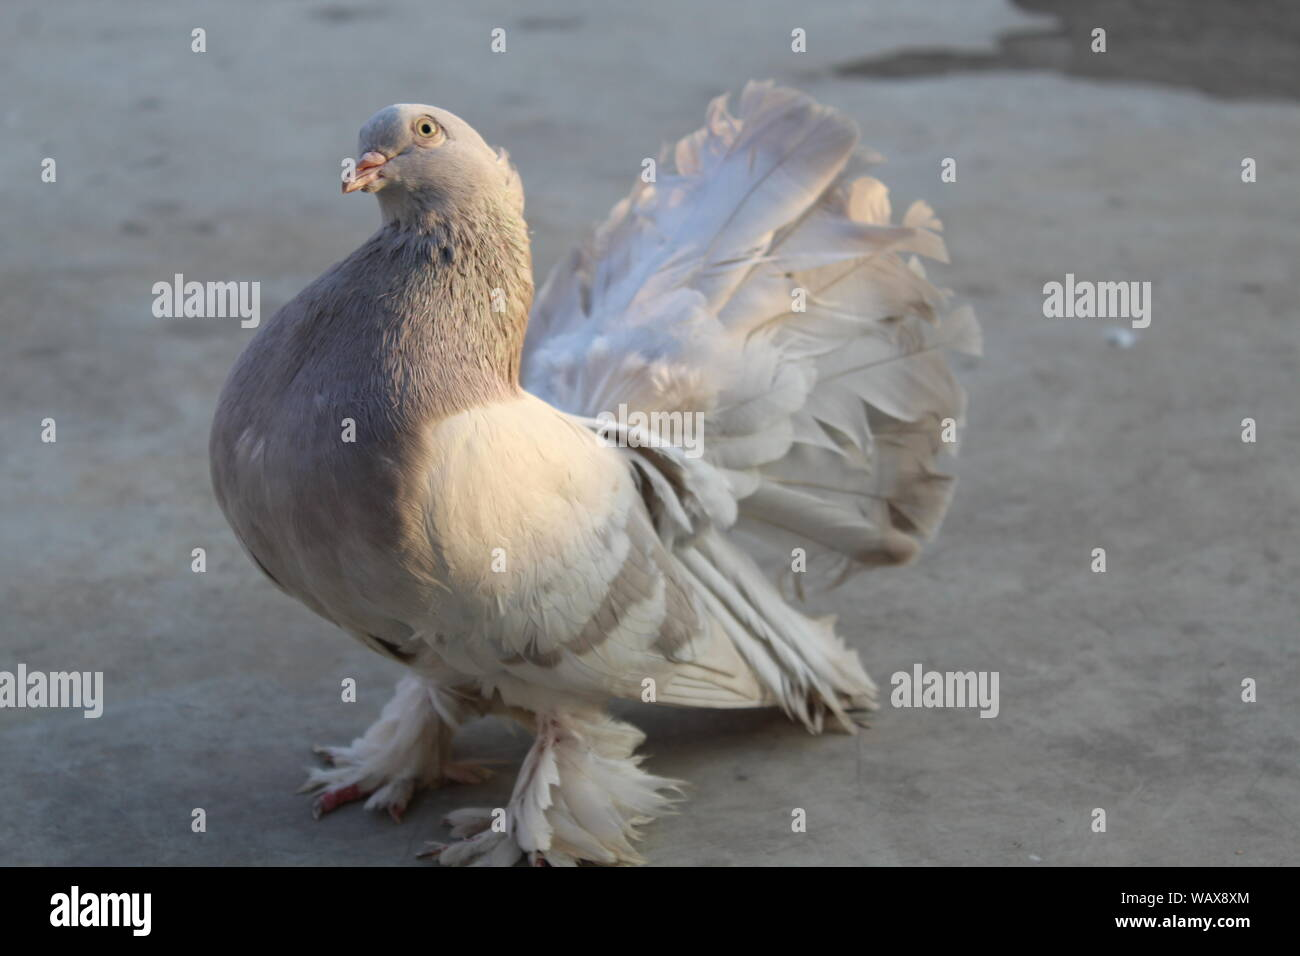 Fancy Pigeons Stock Photos & Fancy Pigeons Stock Images - Alamy